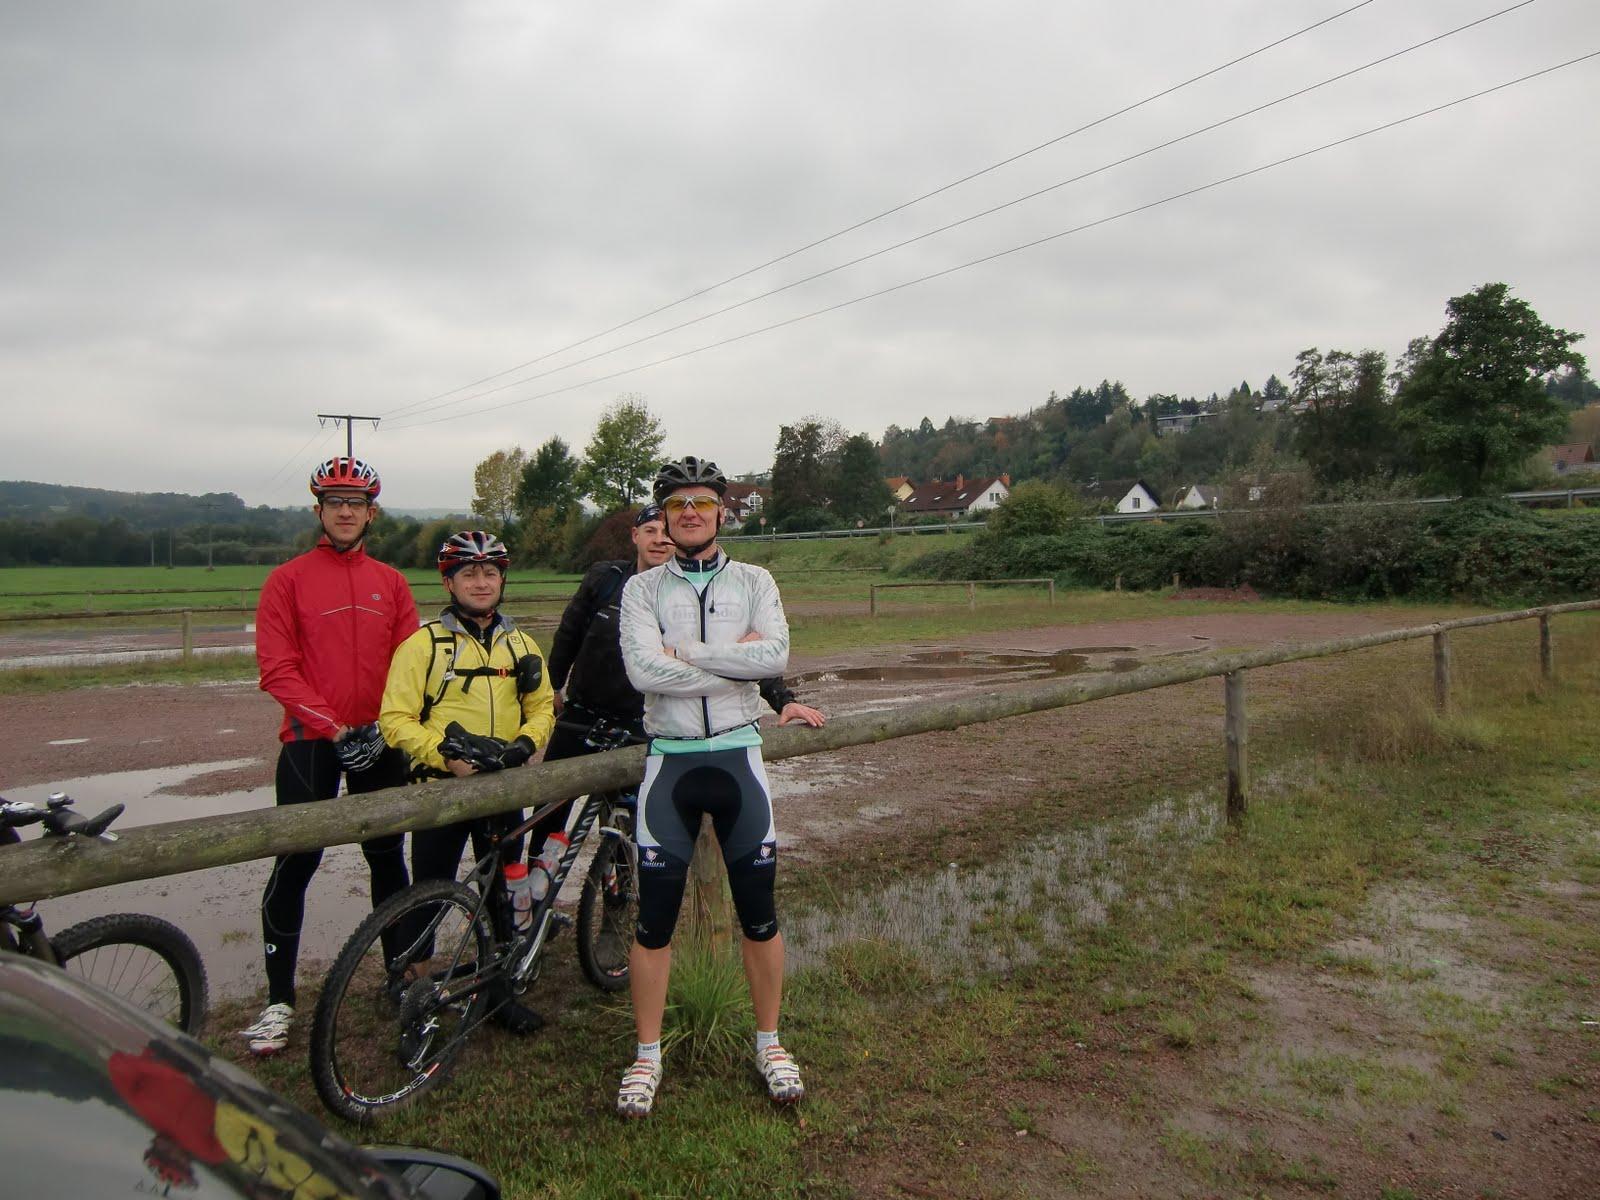 75km/1550 hm. Trails, Trails, Trails